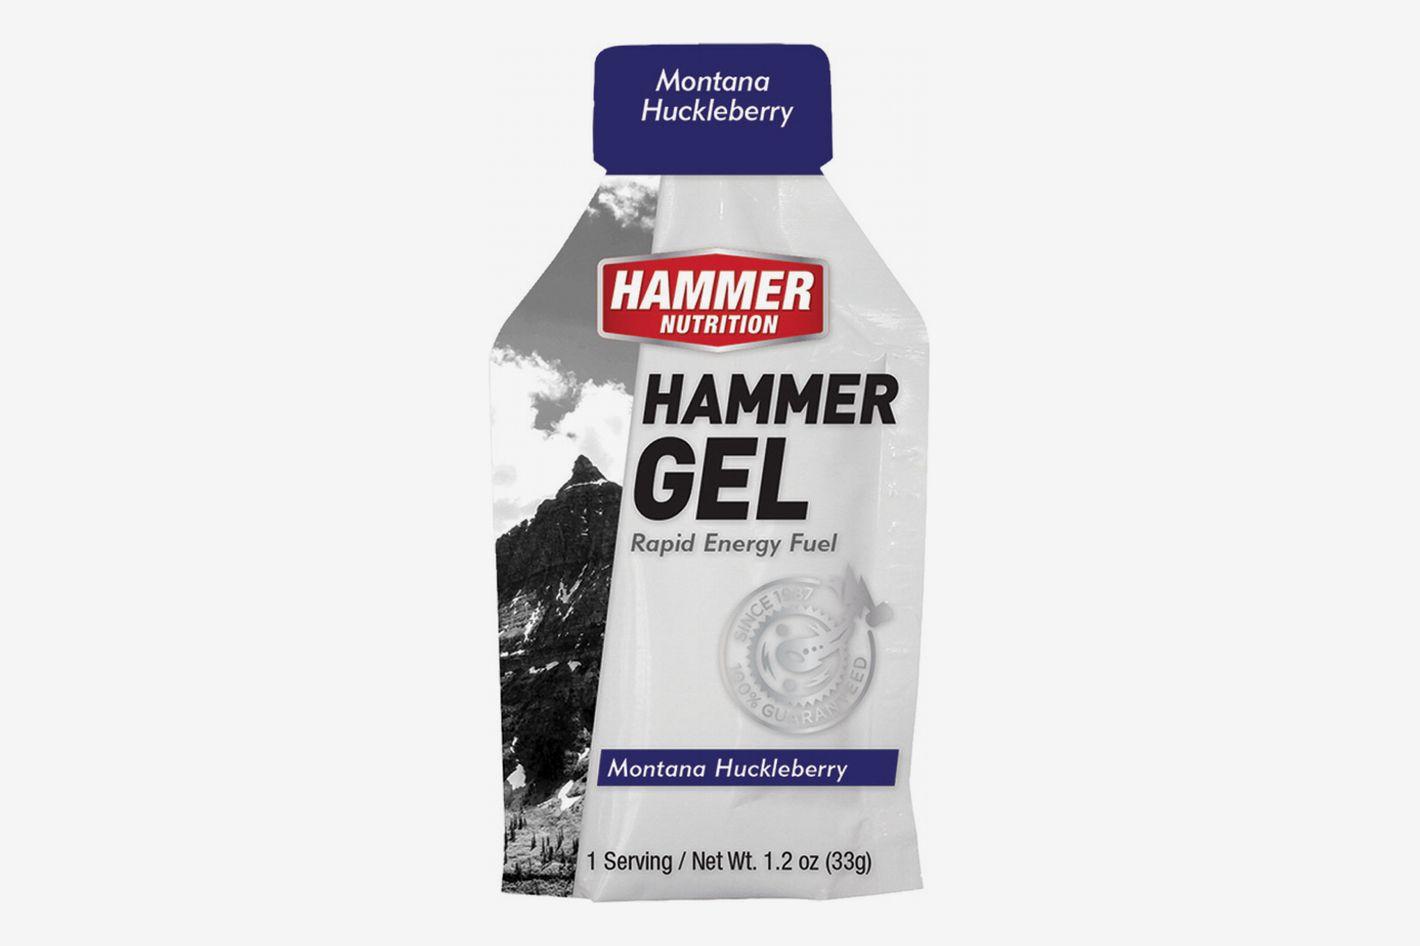 Hammer Nutrition Energy Gel Montana Huckleberry